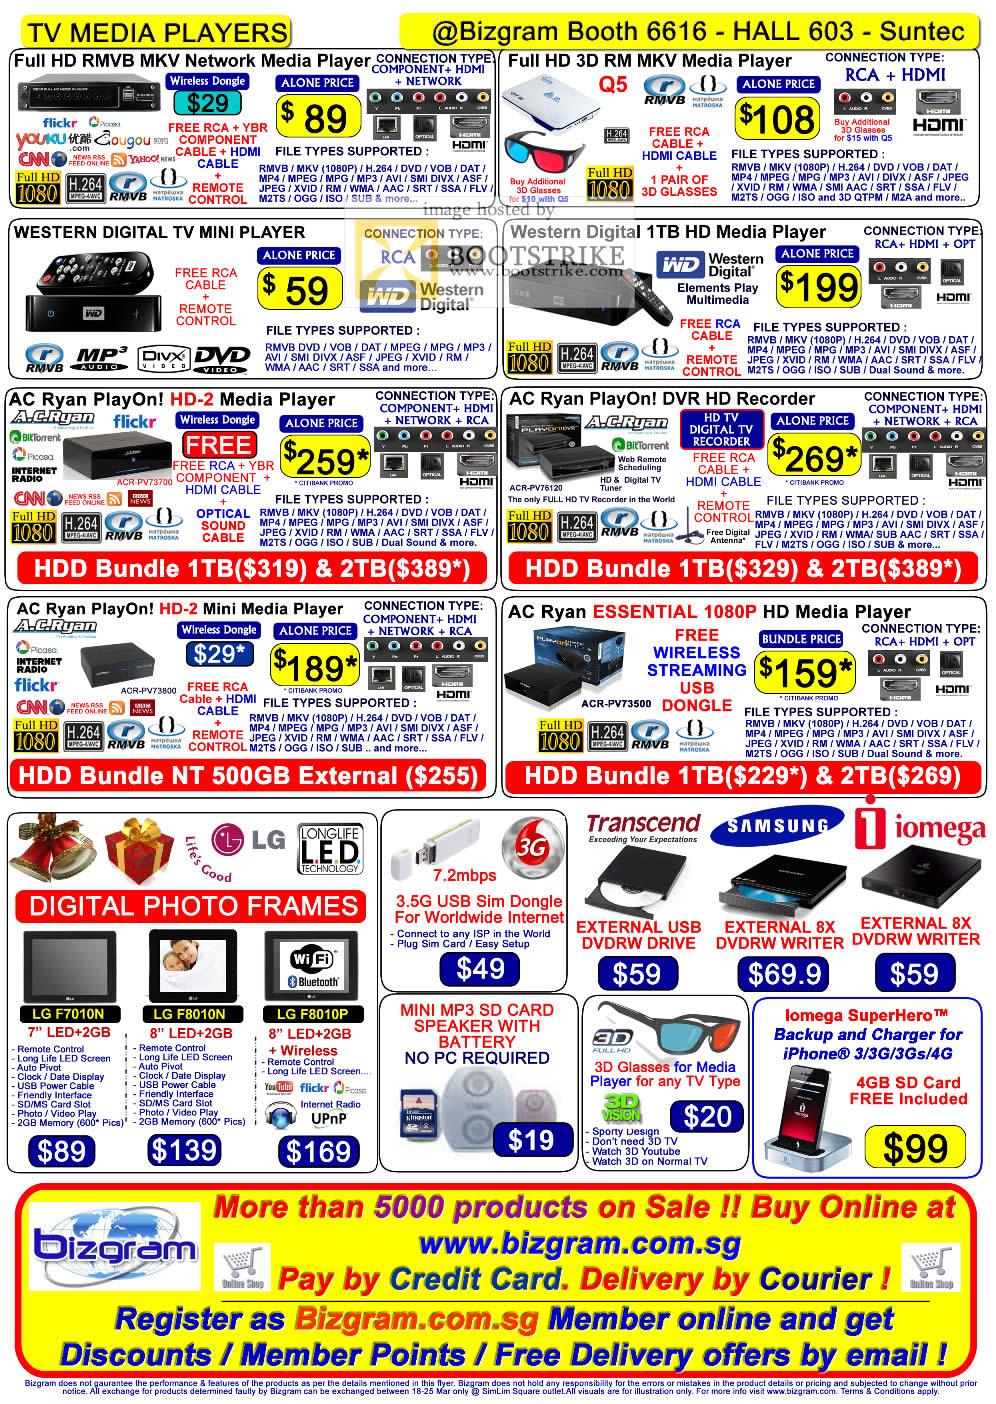 IT Show 2011 price list image brochure of Bizgram TV Media Player Q5 3D WD TV Mini AC Ryan PlayOn HD-2 DVR Essential Digital Photo Frames External DVD Drive SuperHero